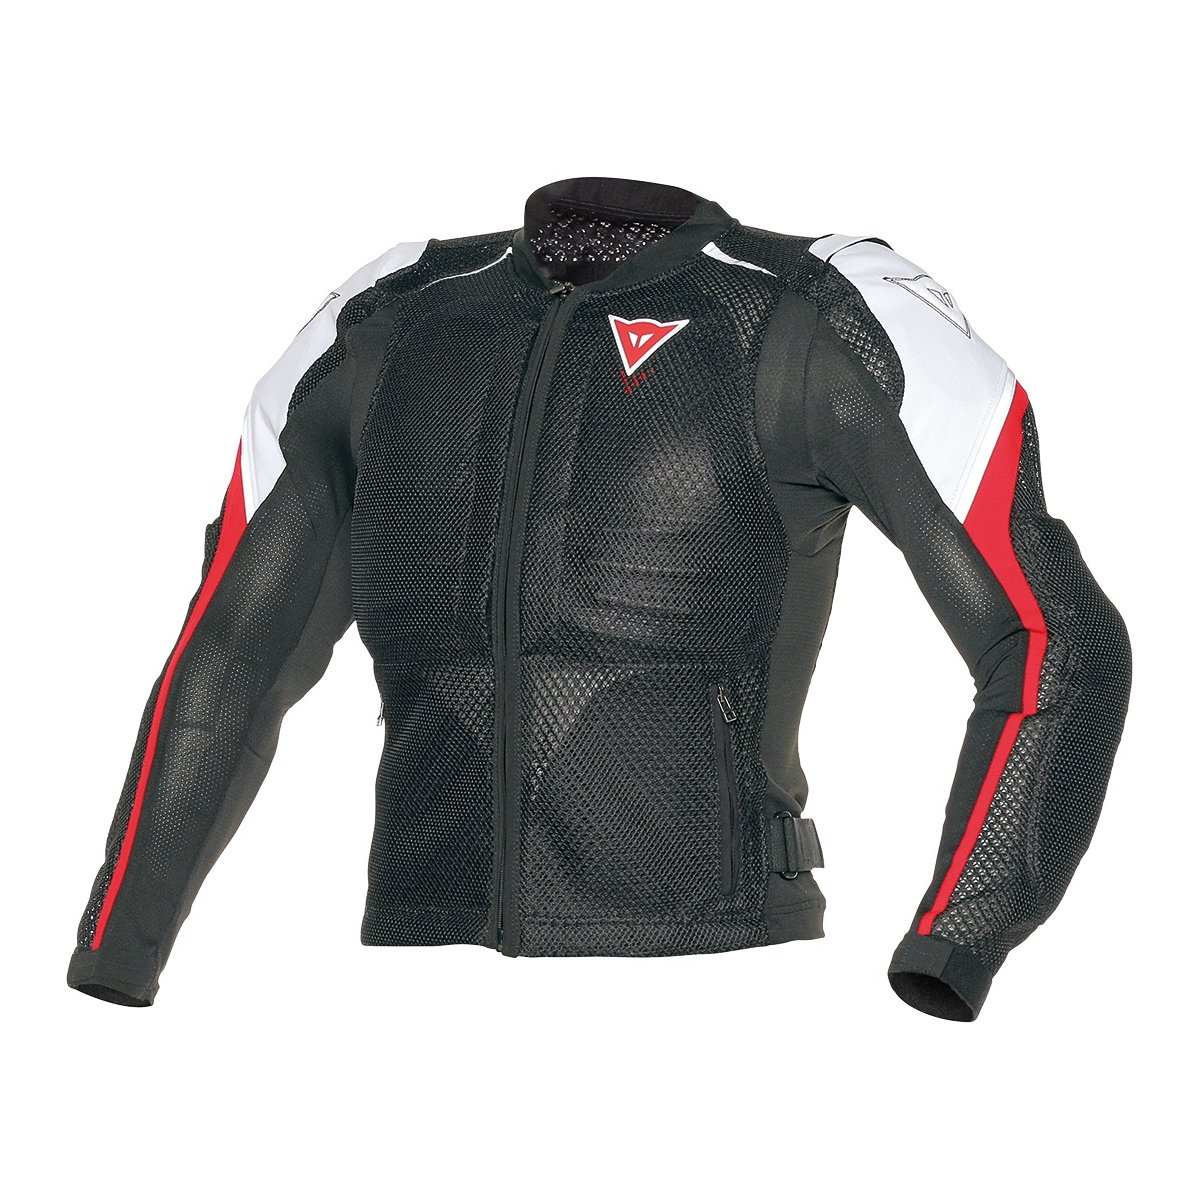 Giacca moto estiva Dainese Sport Guard Nero Bianco